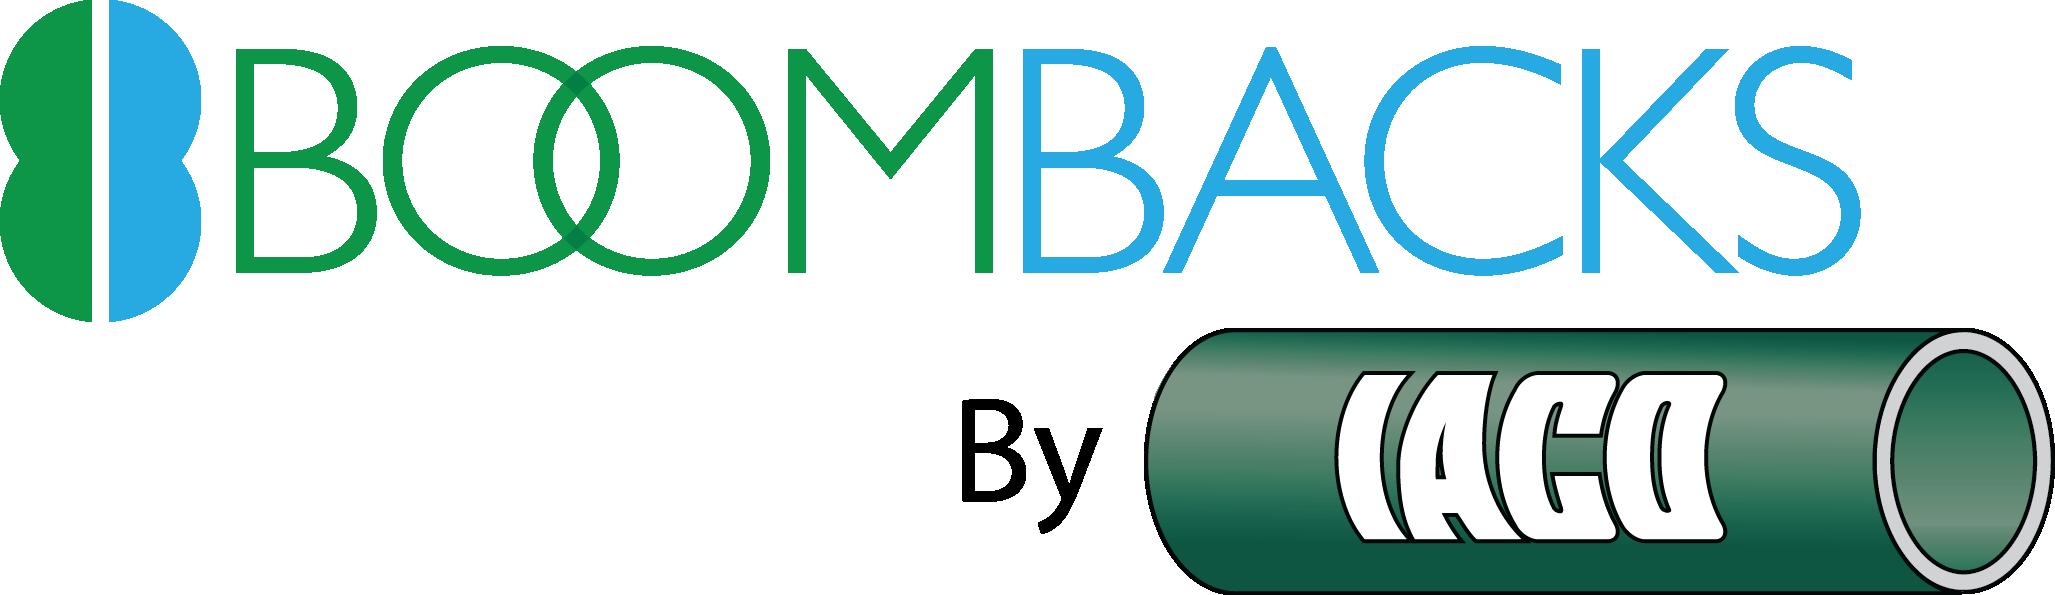 Boombacks